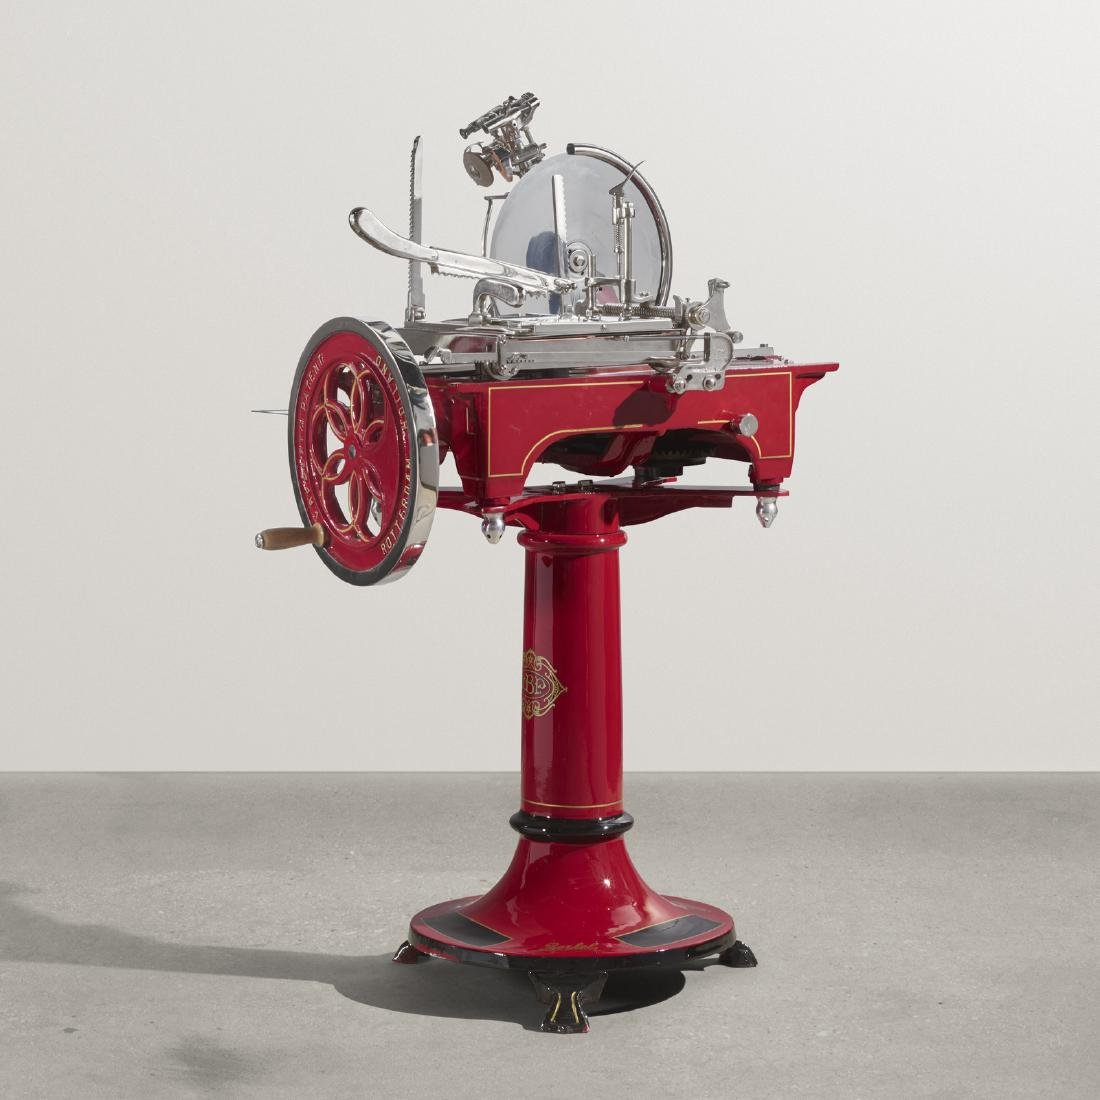 Berkel, Flywheel slicer, model K